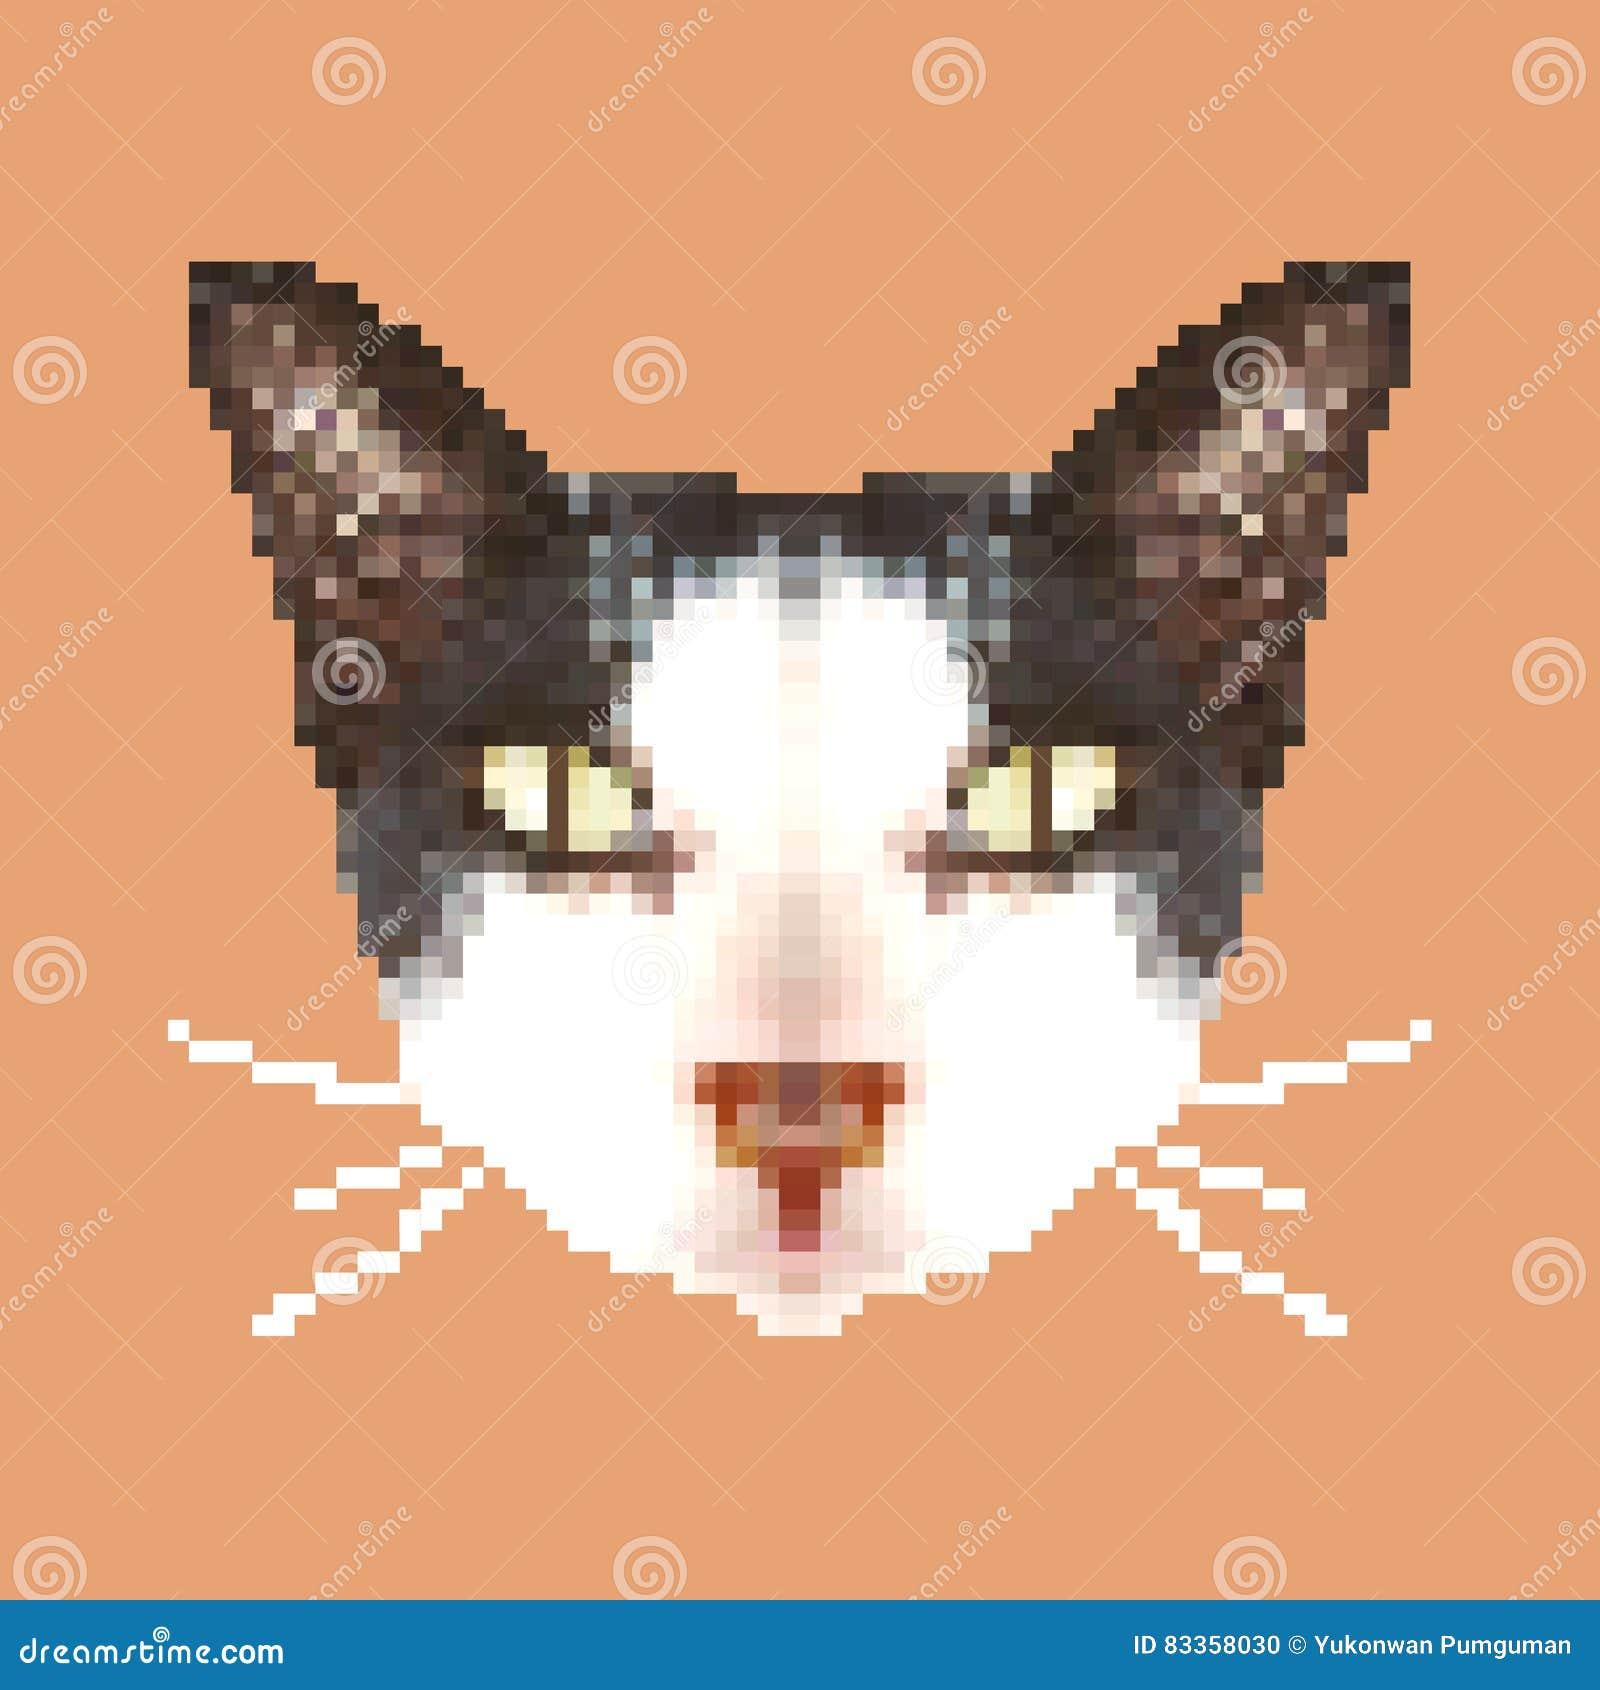 Cat Head Pixel Art Isolated Square Animal Vector Stock